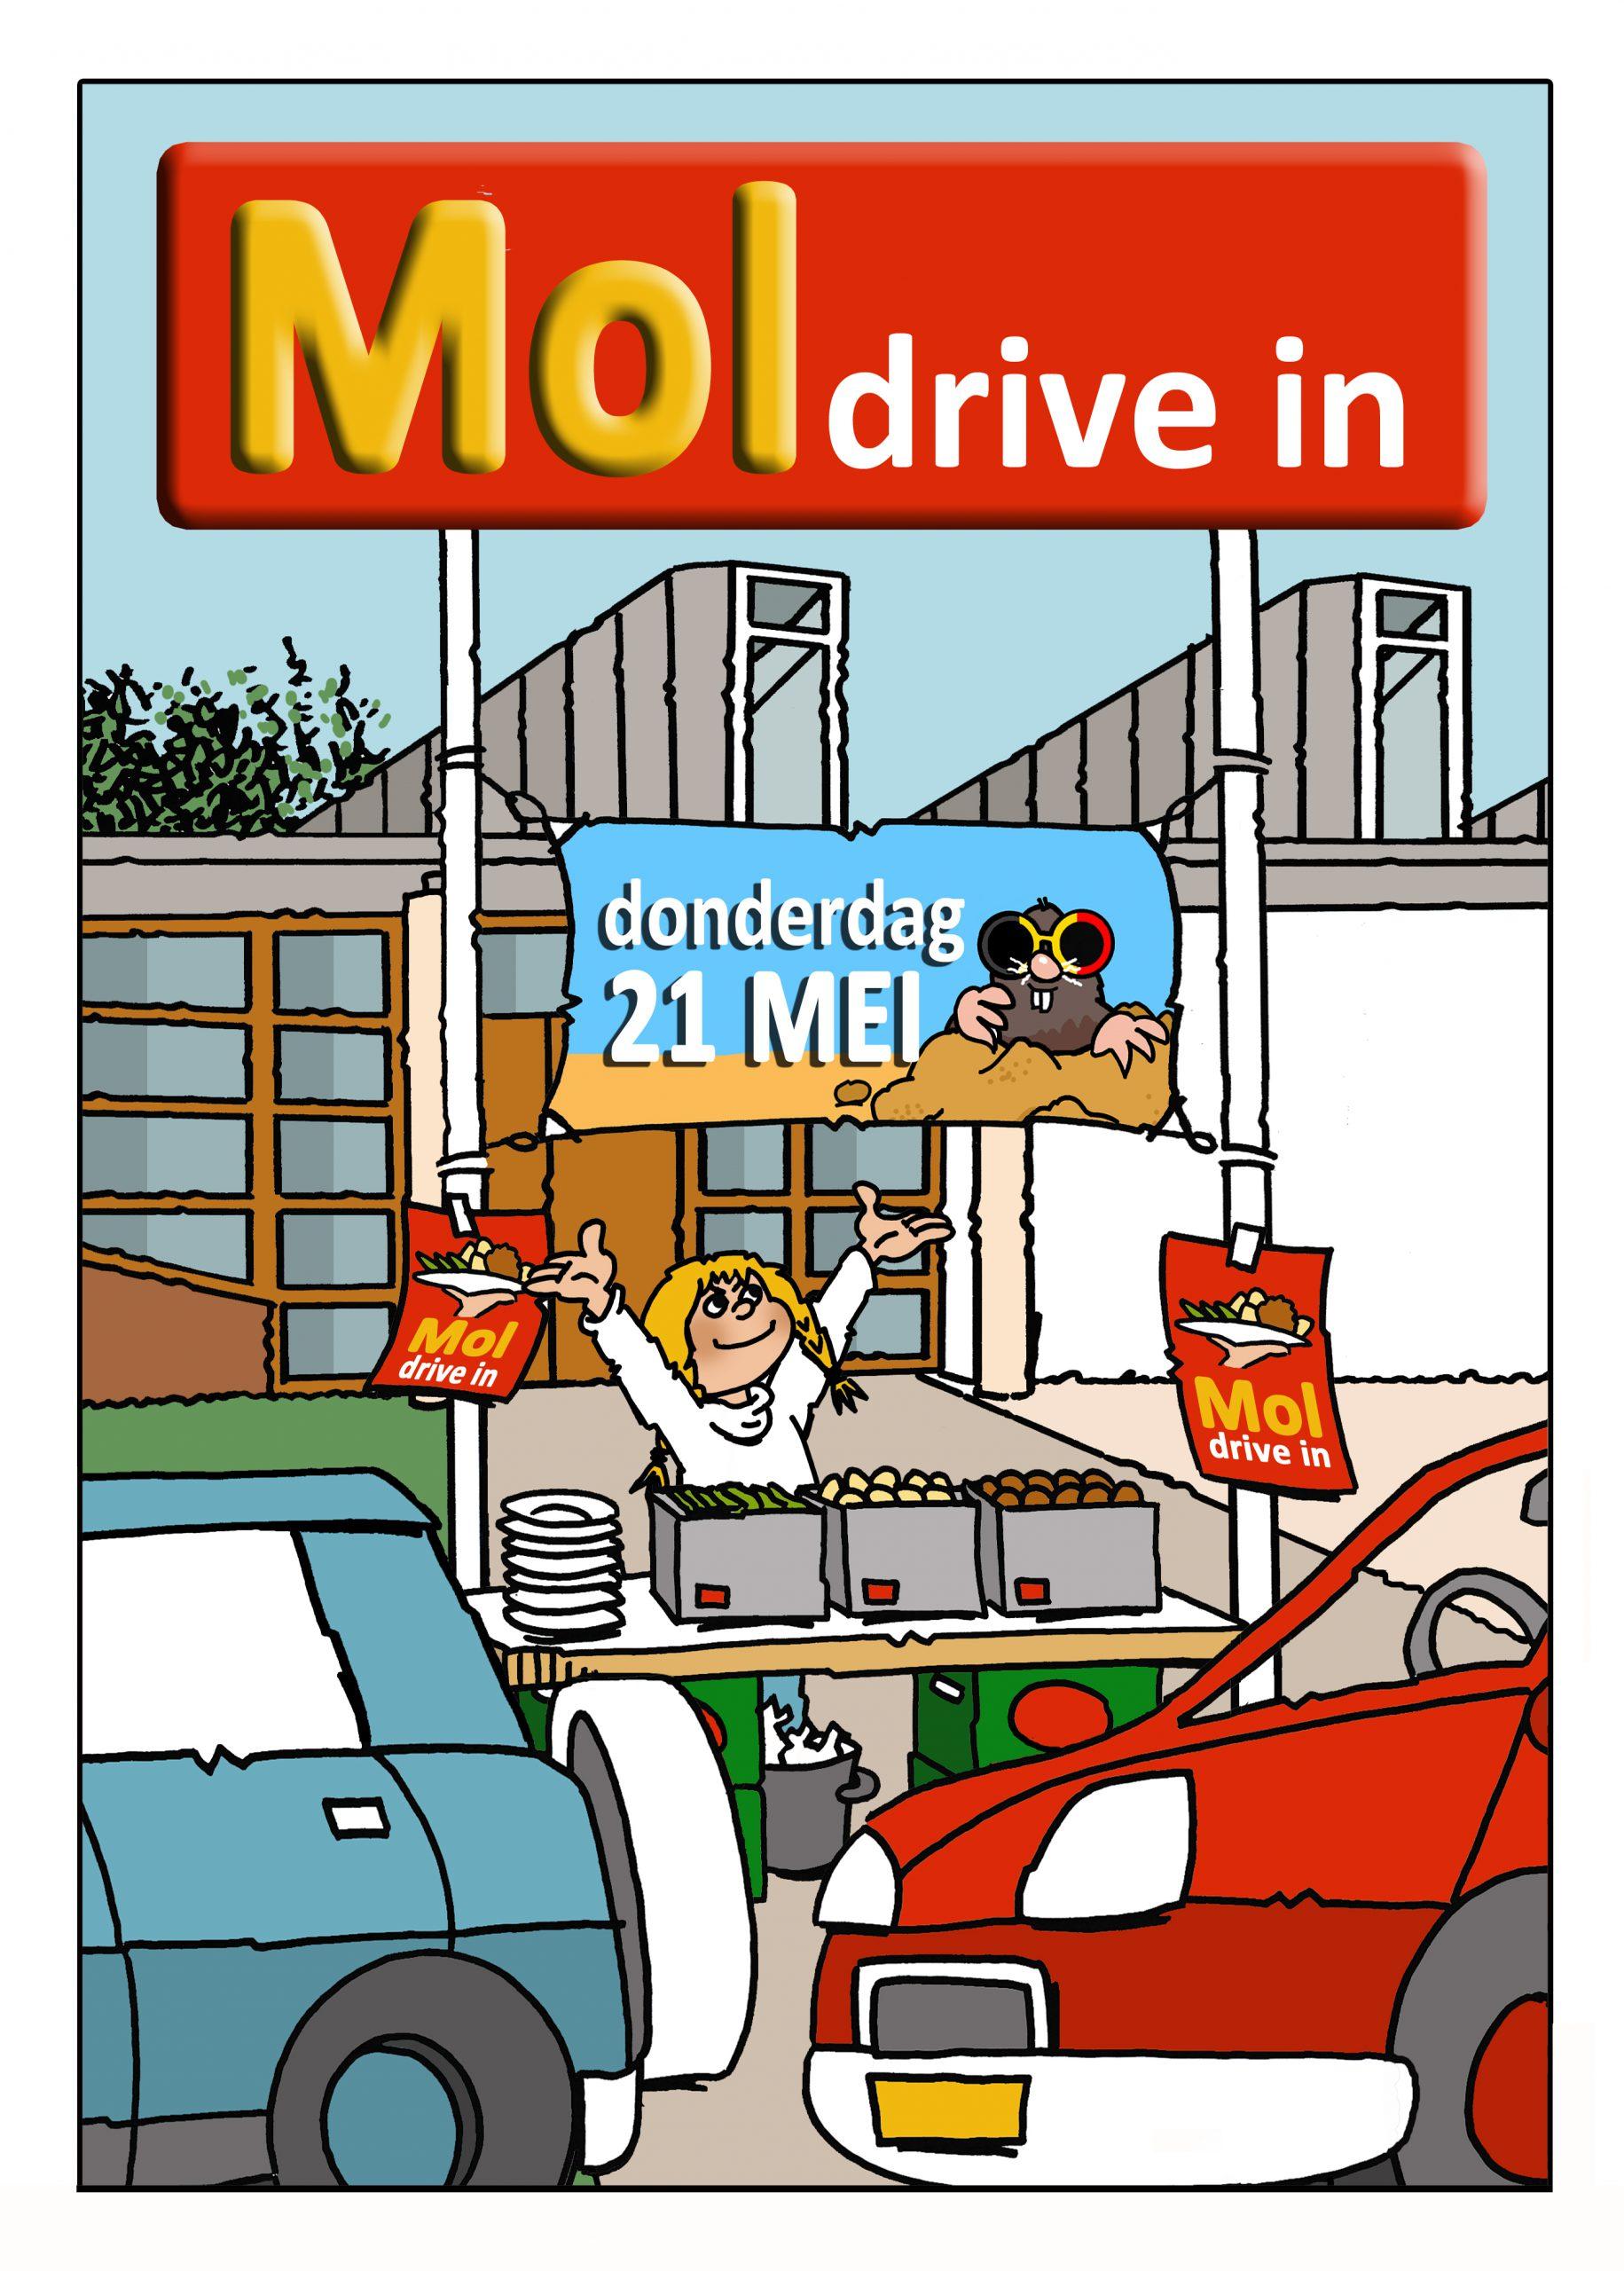 Mol drive in bericht